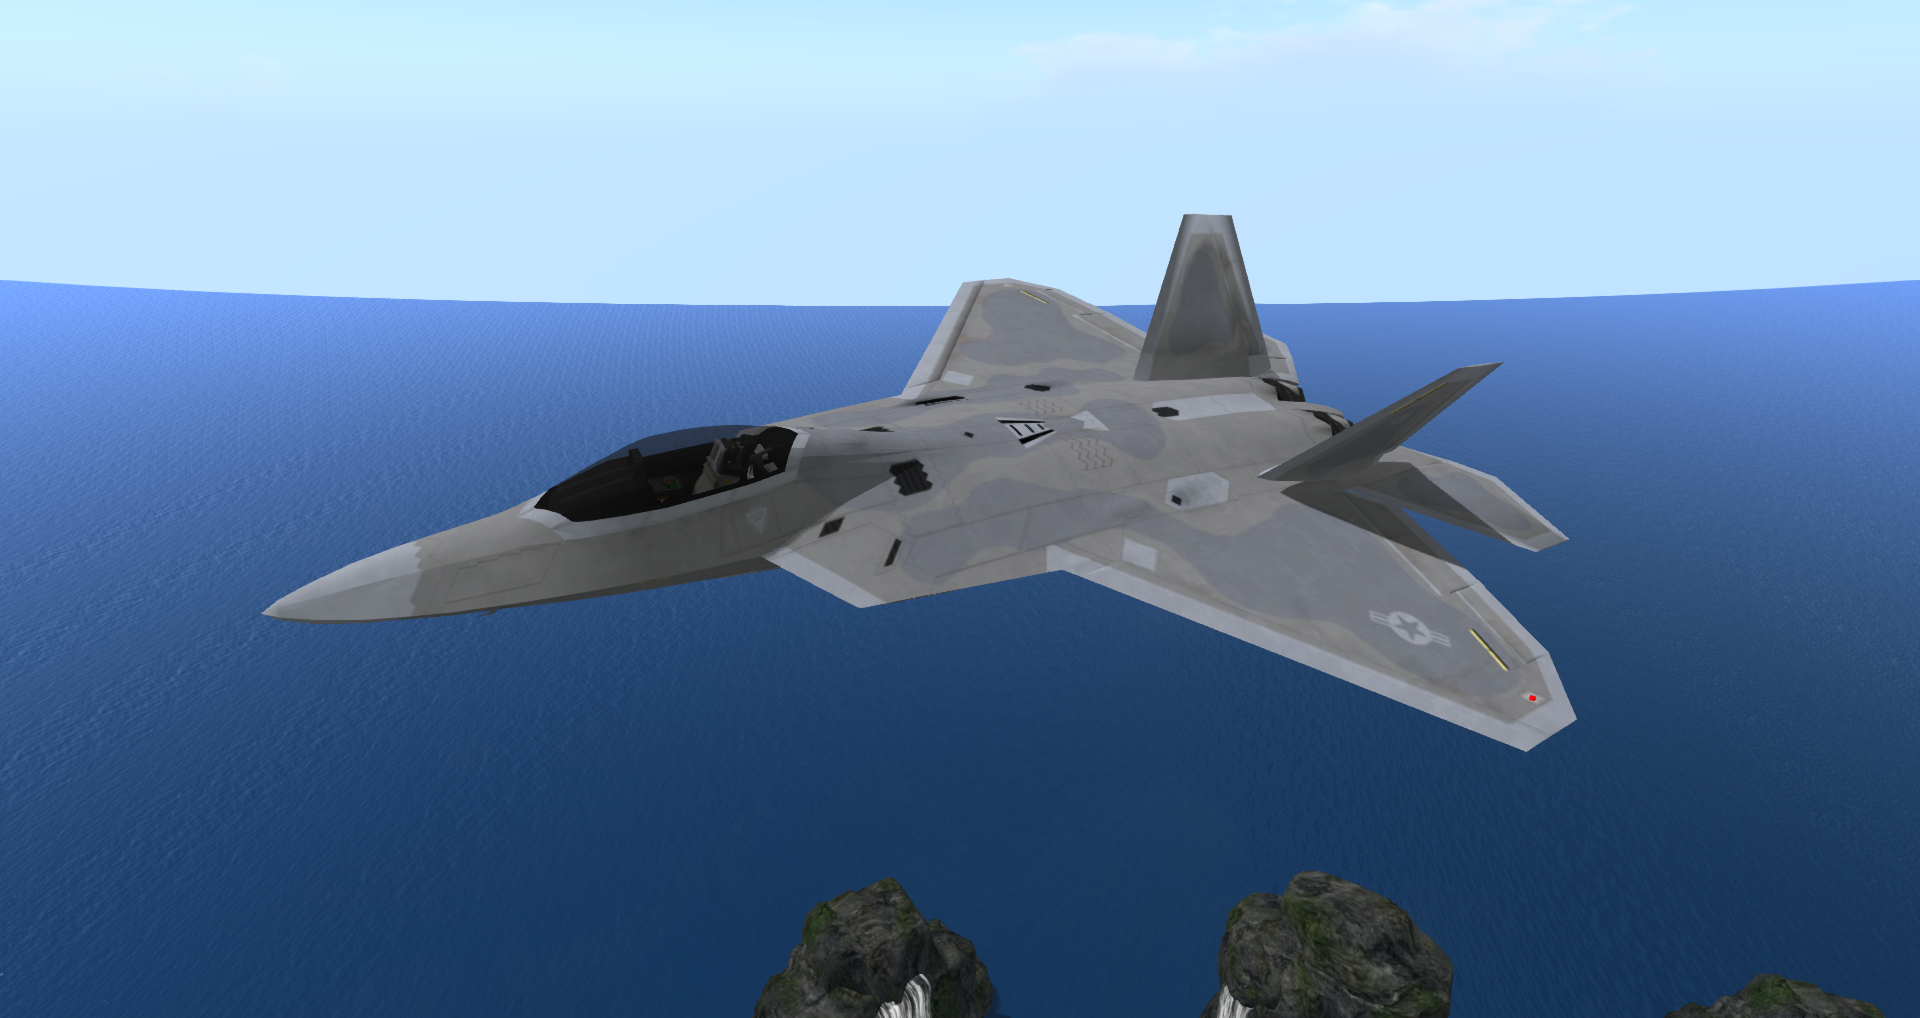 Lockheed Martin F-22 Raptor & F-22 Raptor (E-Tech) | Second Life Aviation Wiki | FANDOM powered ...